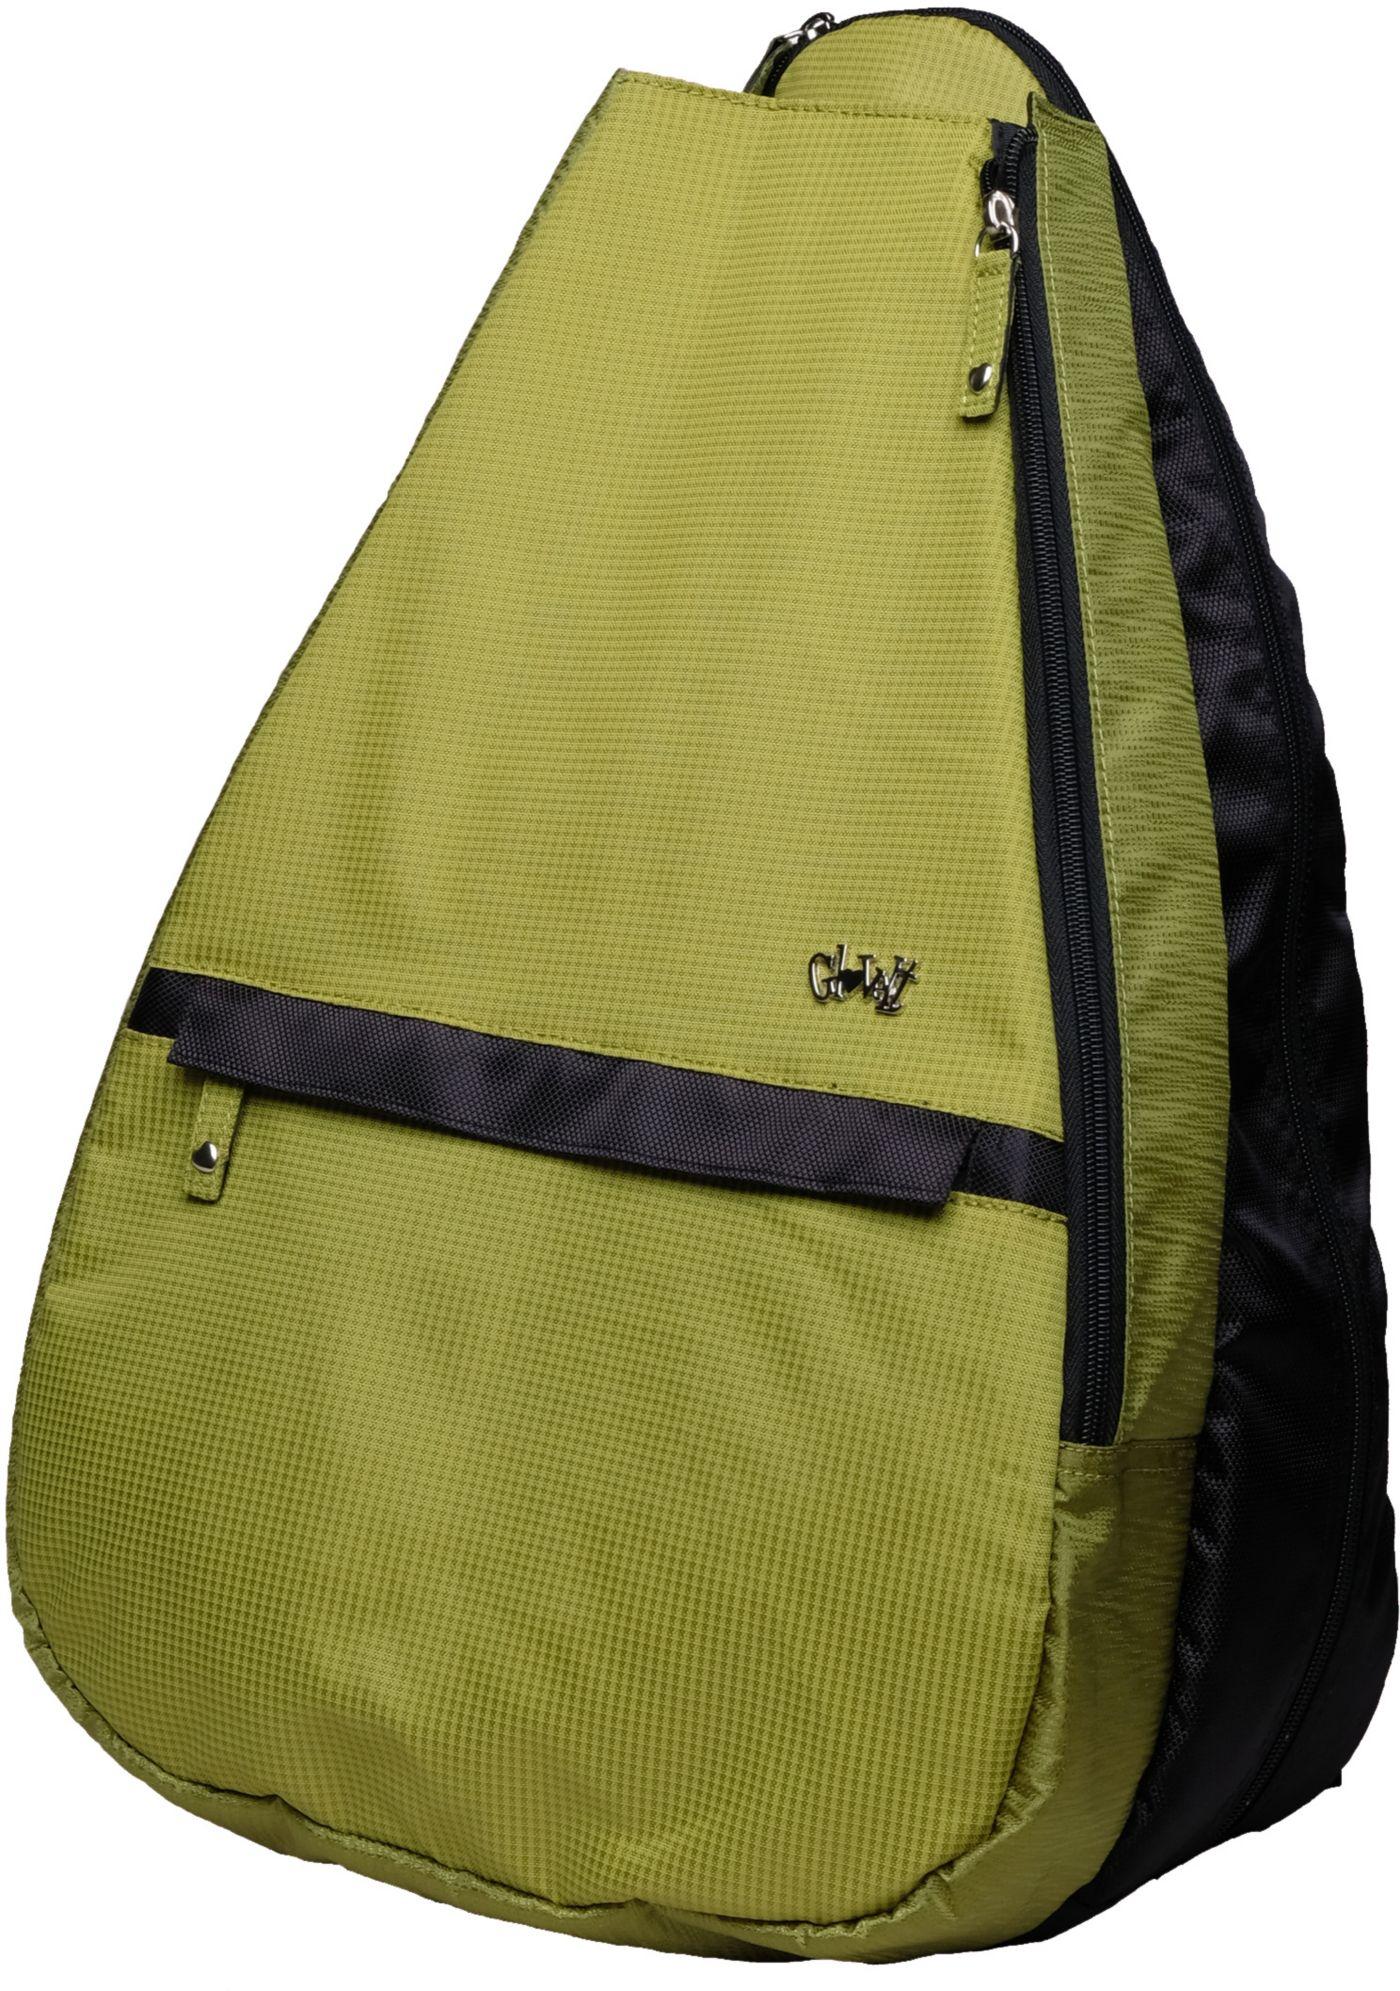 Glove It Women's Tennis Backpack